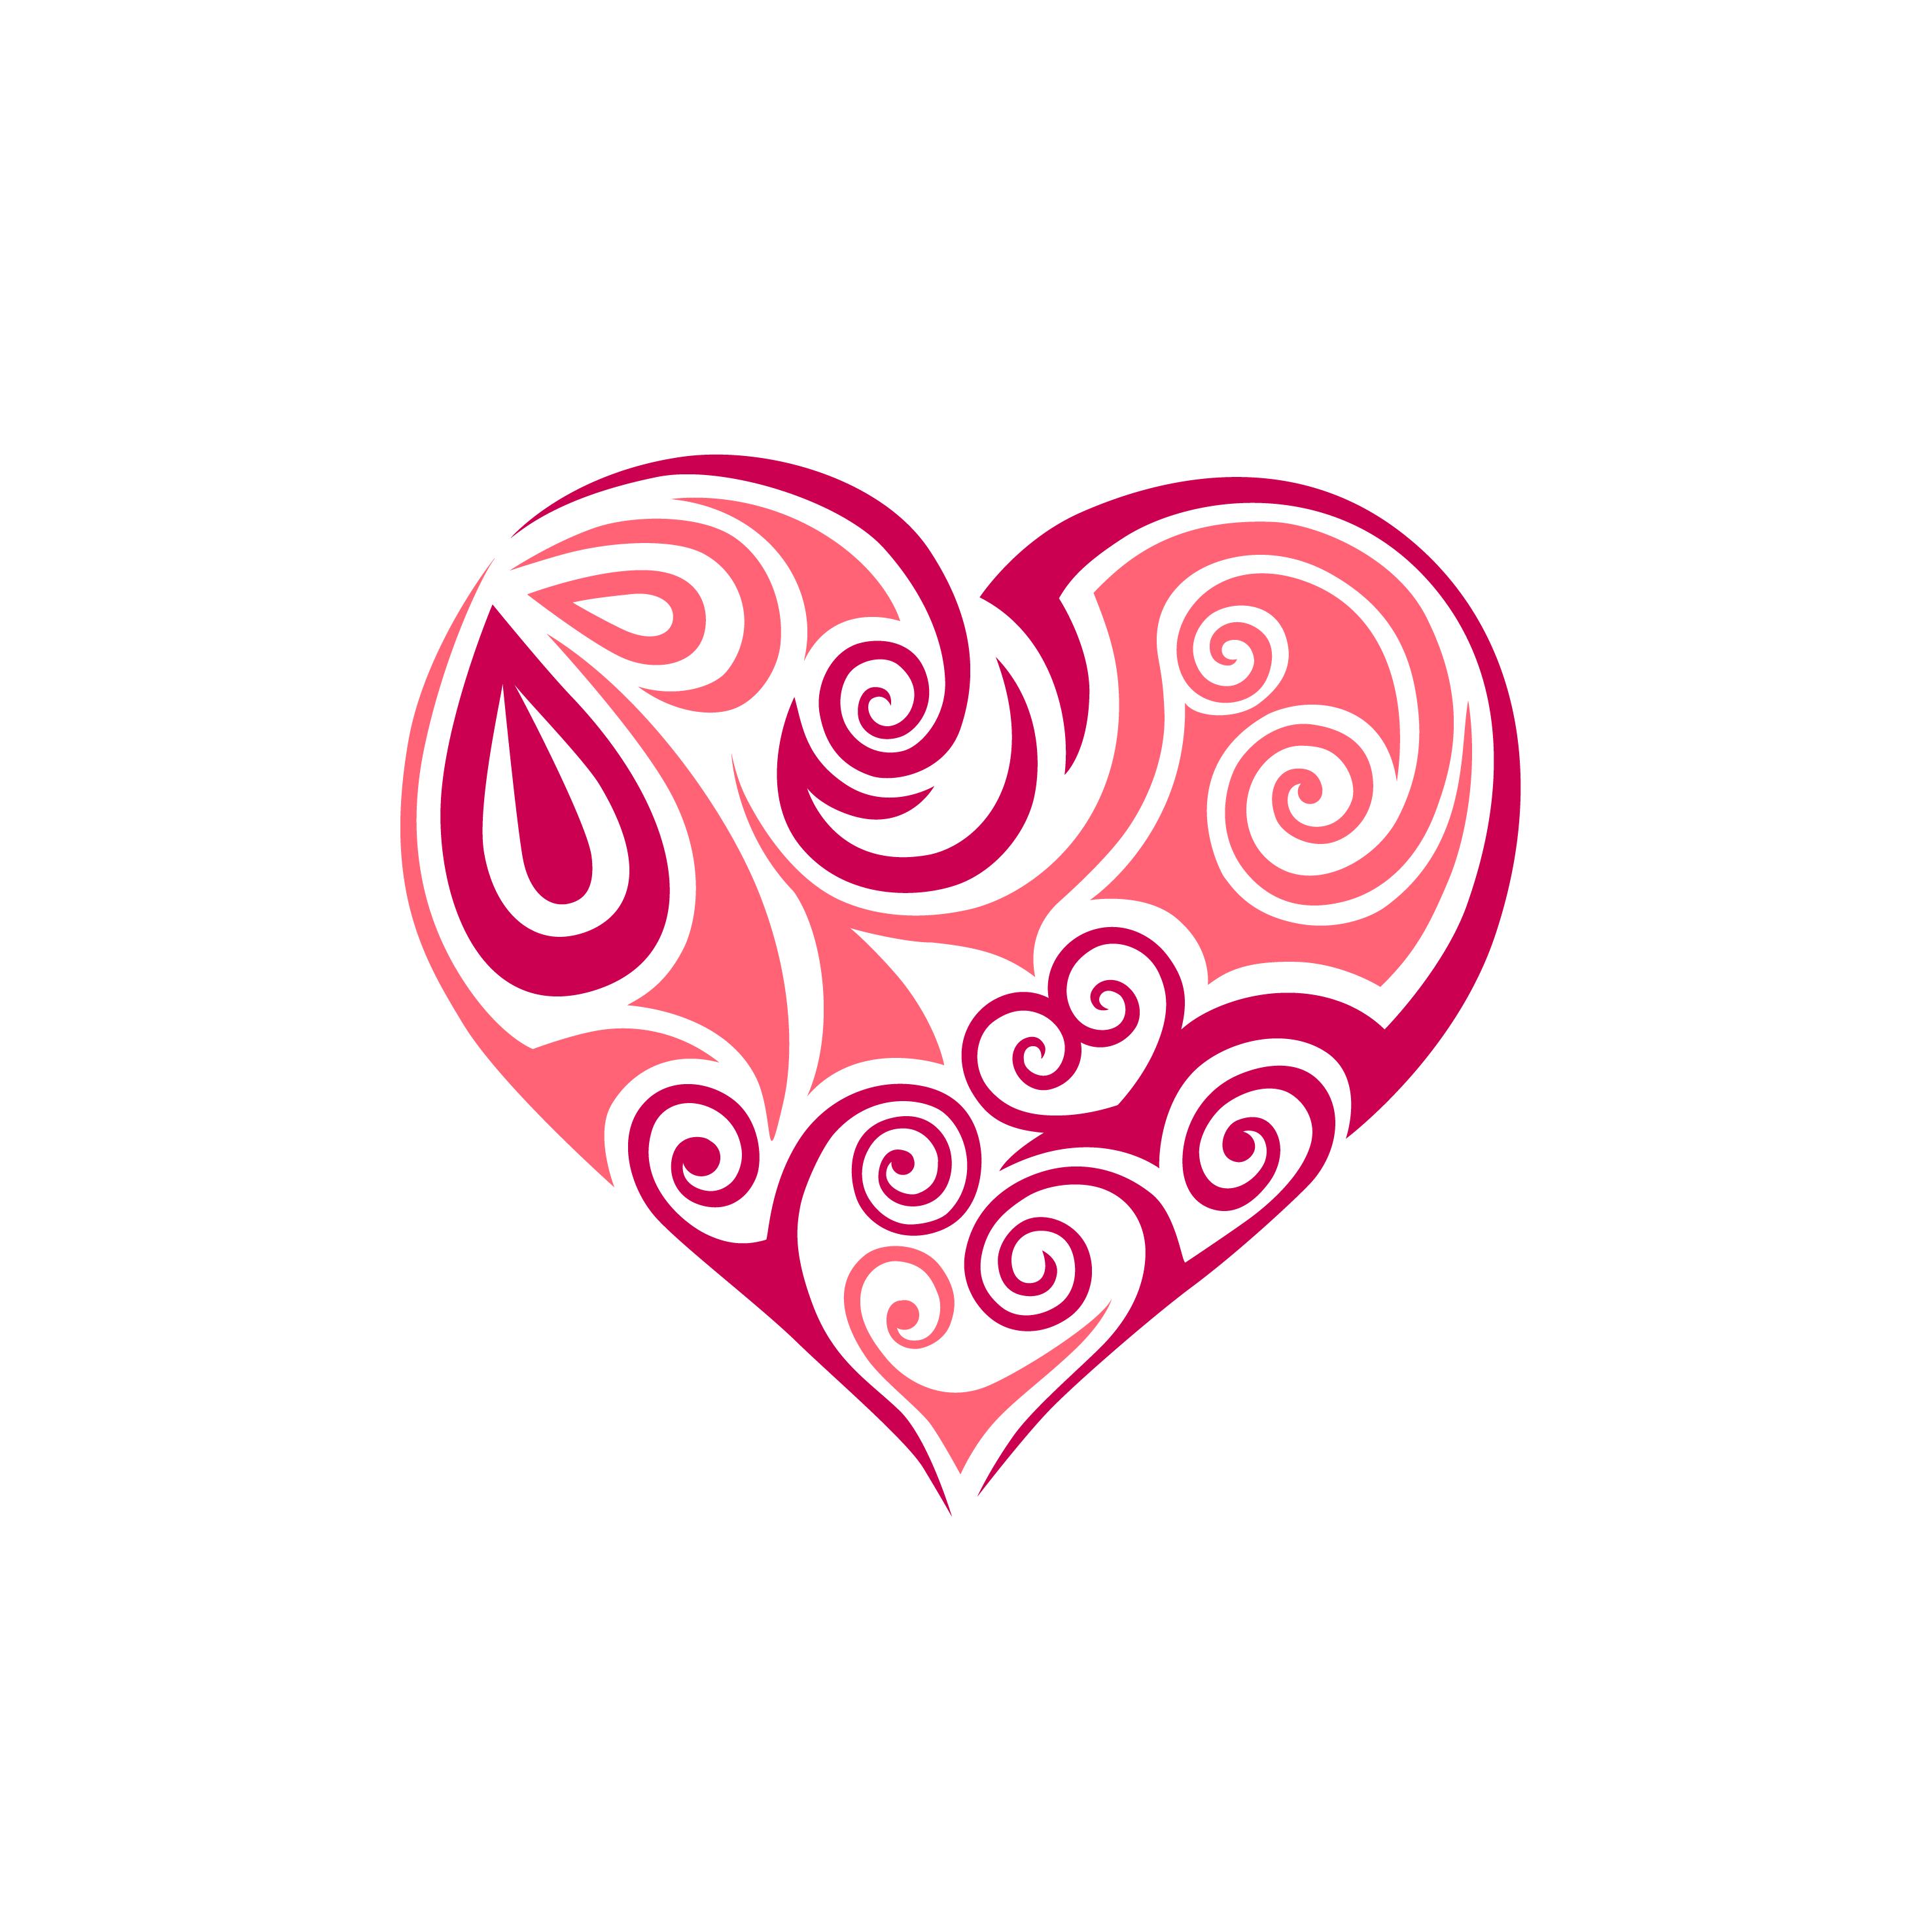 swirly-heart.png